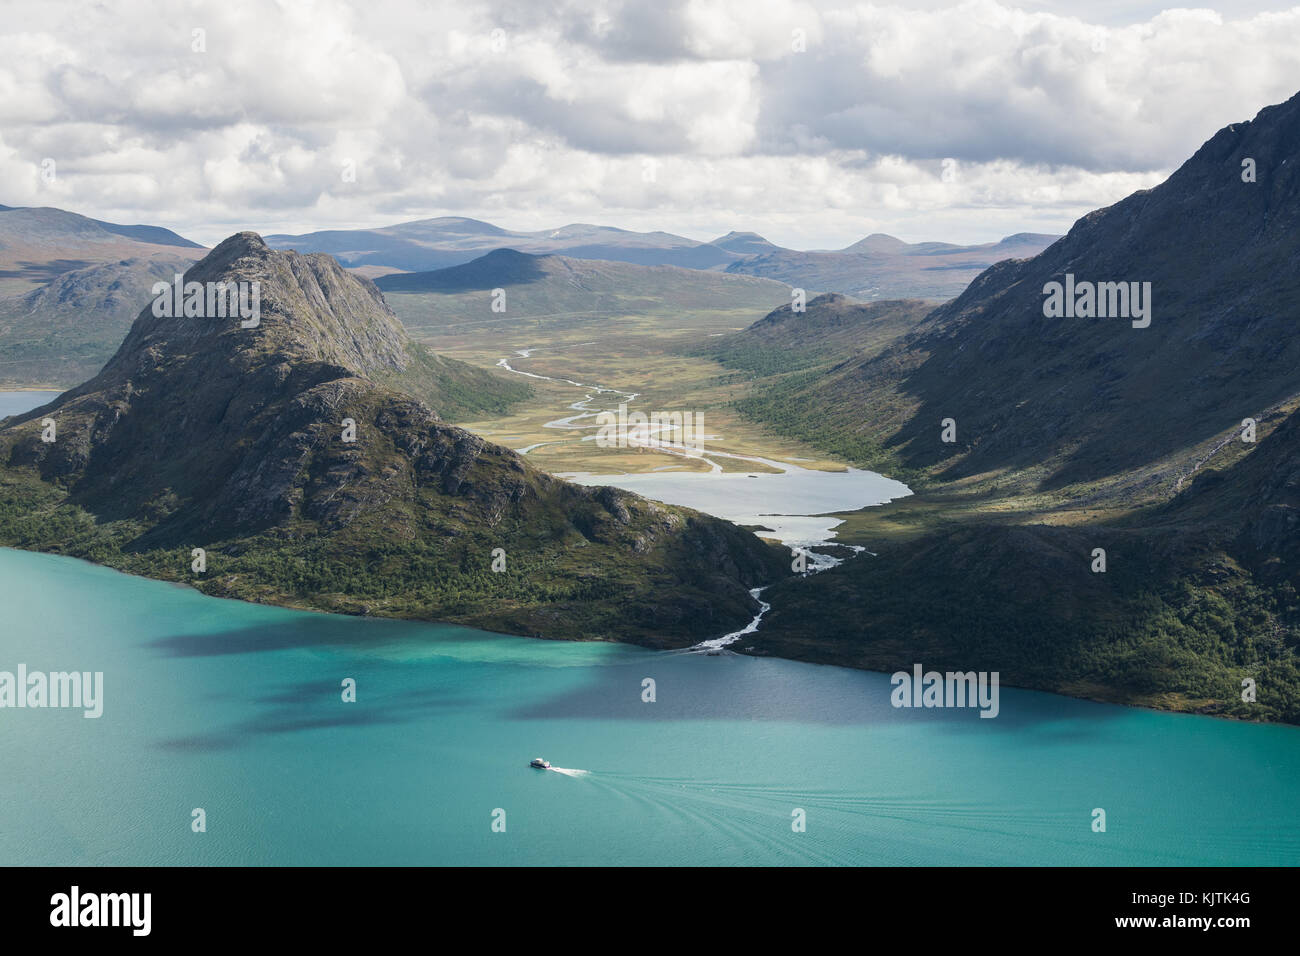 View from Besseggen ridge over Gjende and Ovre Leirungen lakes, Norway - Stock Image